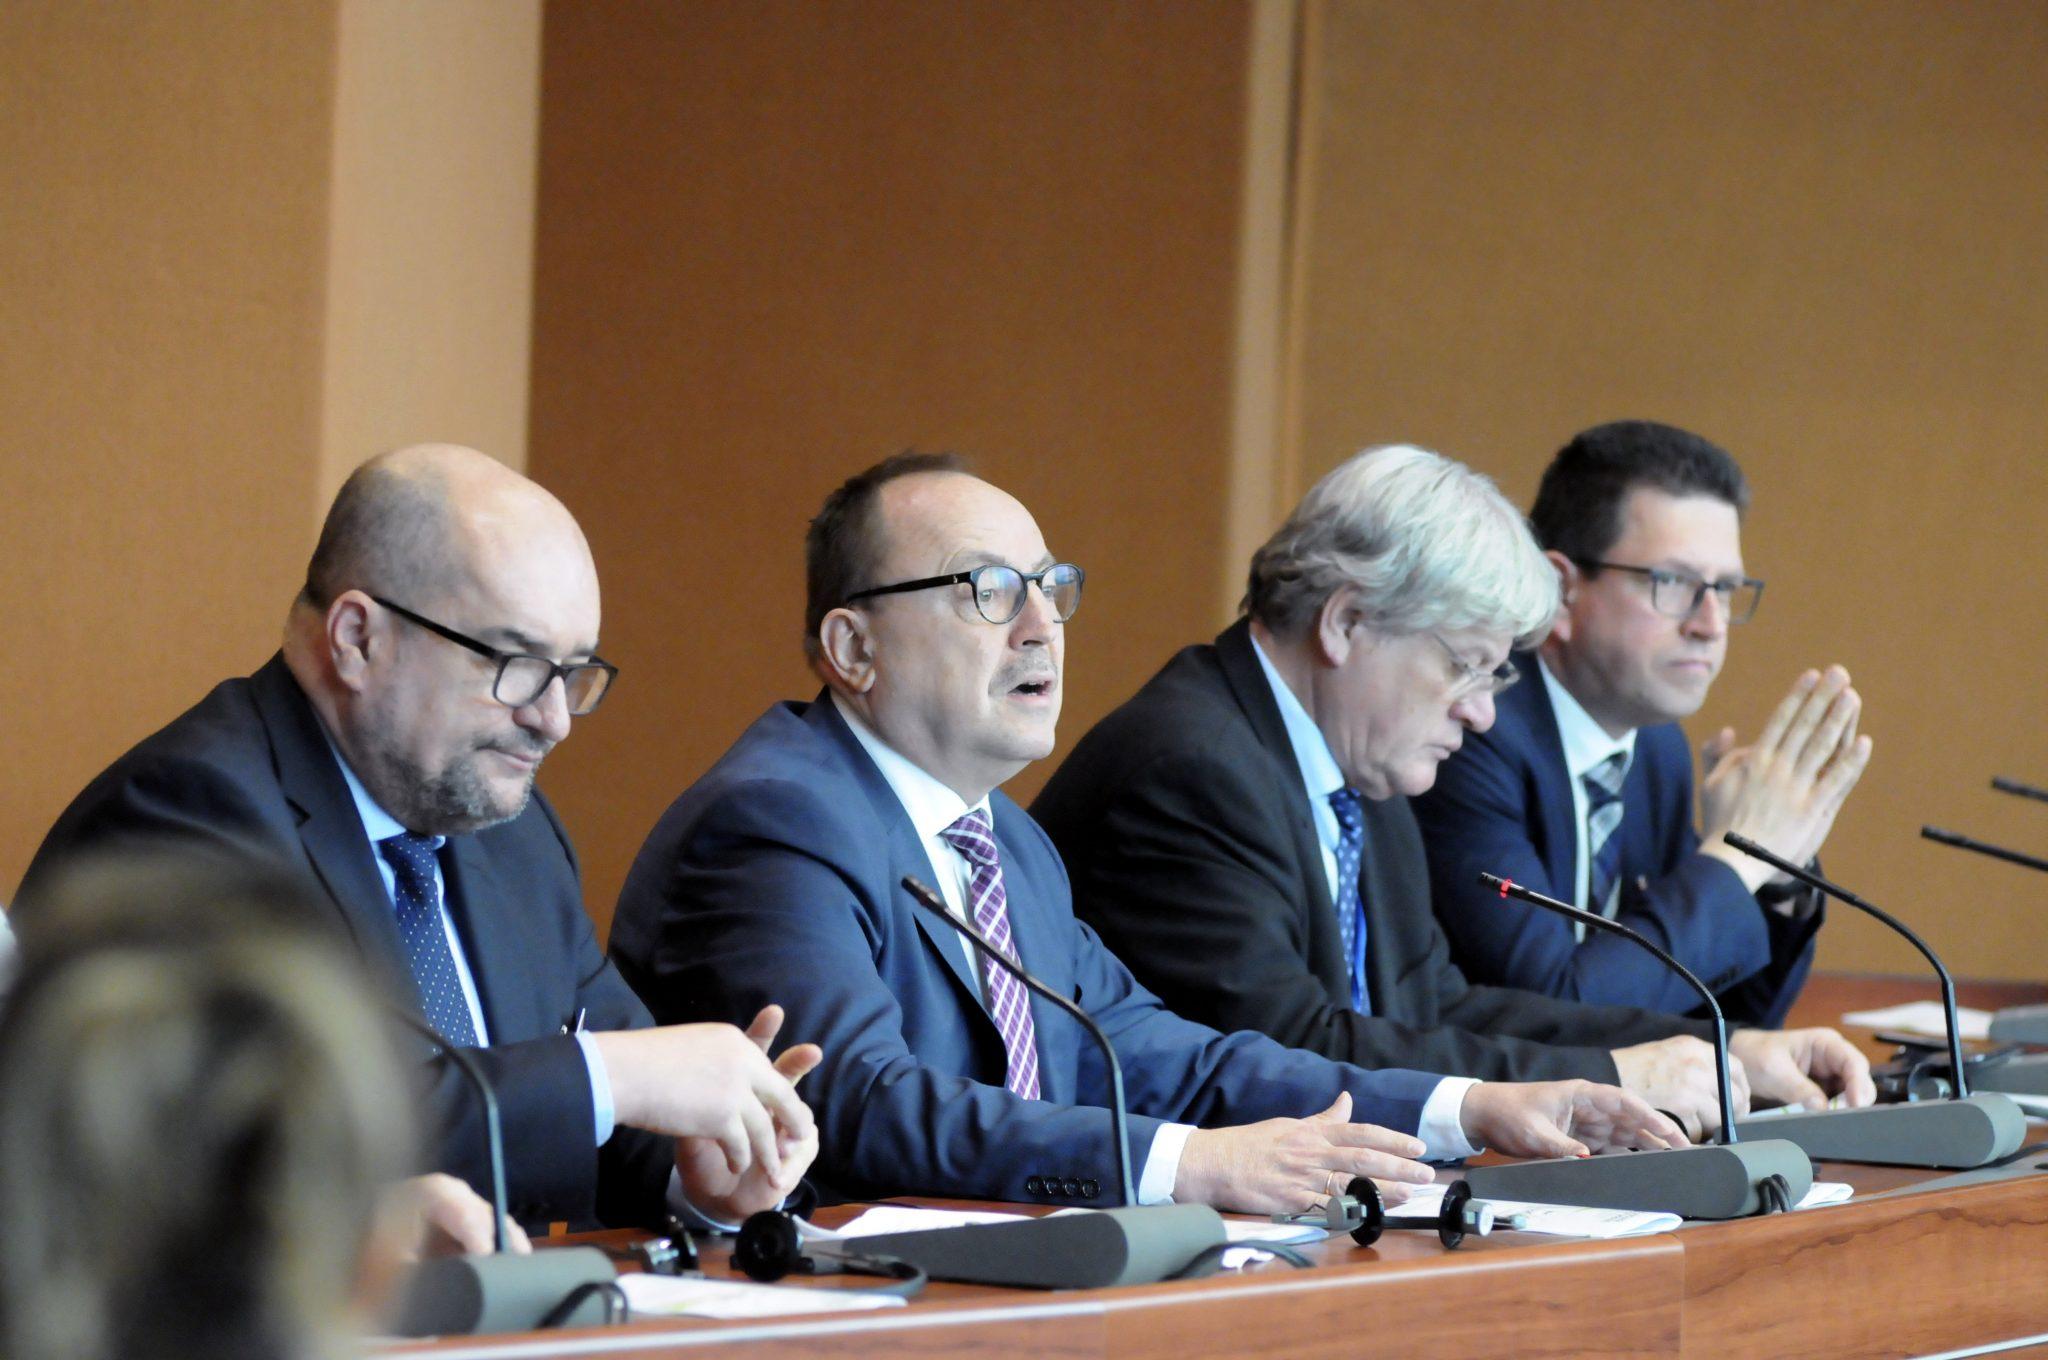 Fidesz: Ukraine Should Suspend Language Bill Debate post's picture